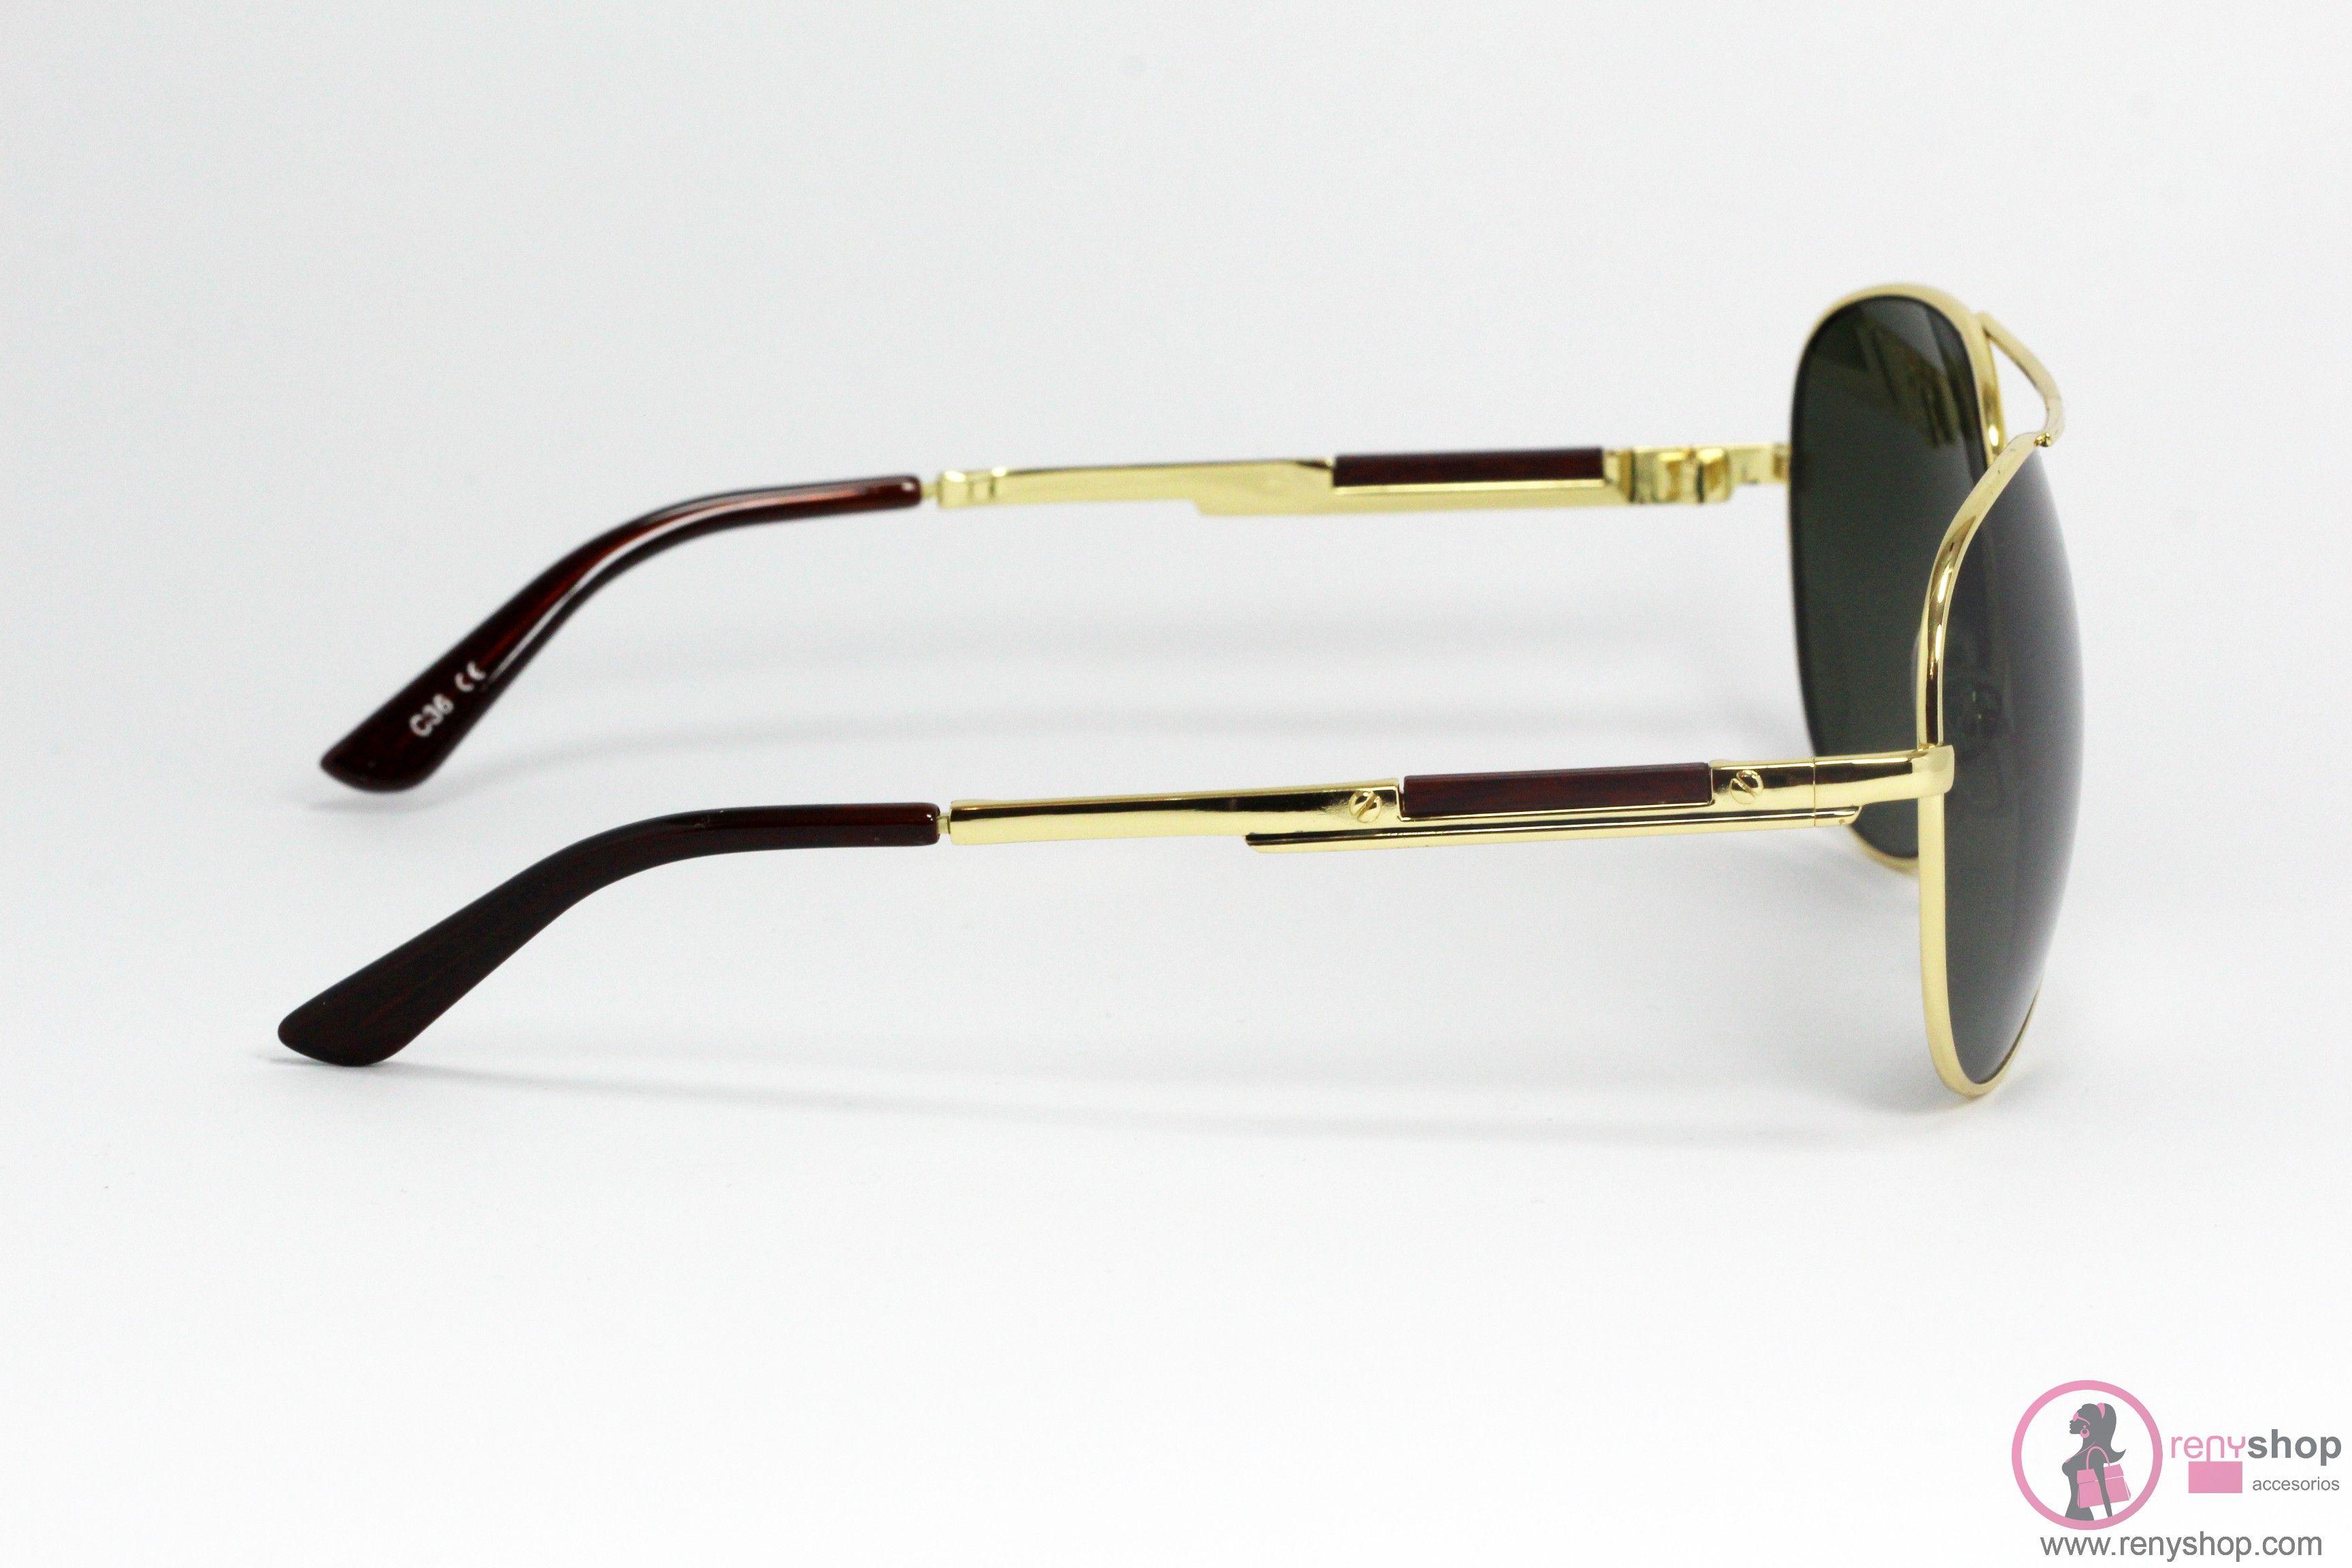 http://renyshop.com/16-lentes #summer #fashionaddict #fashion #sunglasses #sun #fashionstyle #lifestyle #gafas #sol #anteojos #eyes #friends #life #love #lovley #glasses #lentes #fashionista #moda #mensfashion #girlsfashion #beautiful #lentes #lentessol #renyshop